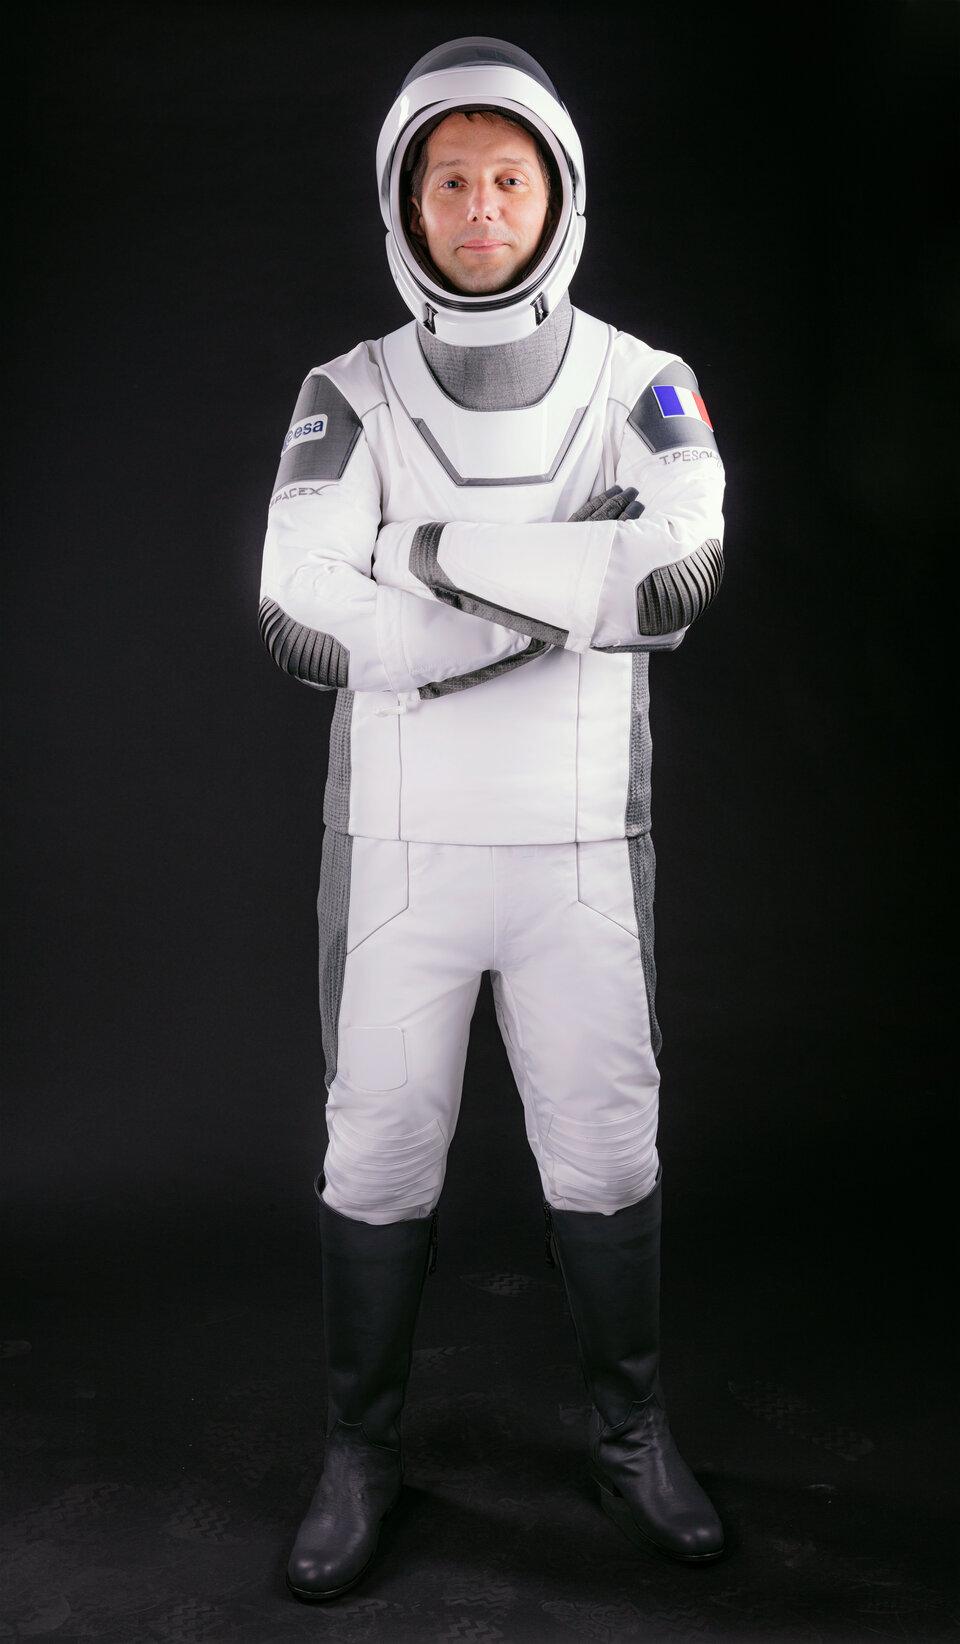 Thomas dans sa combinaison SpaceX